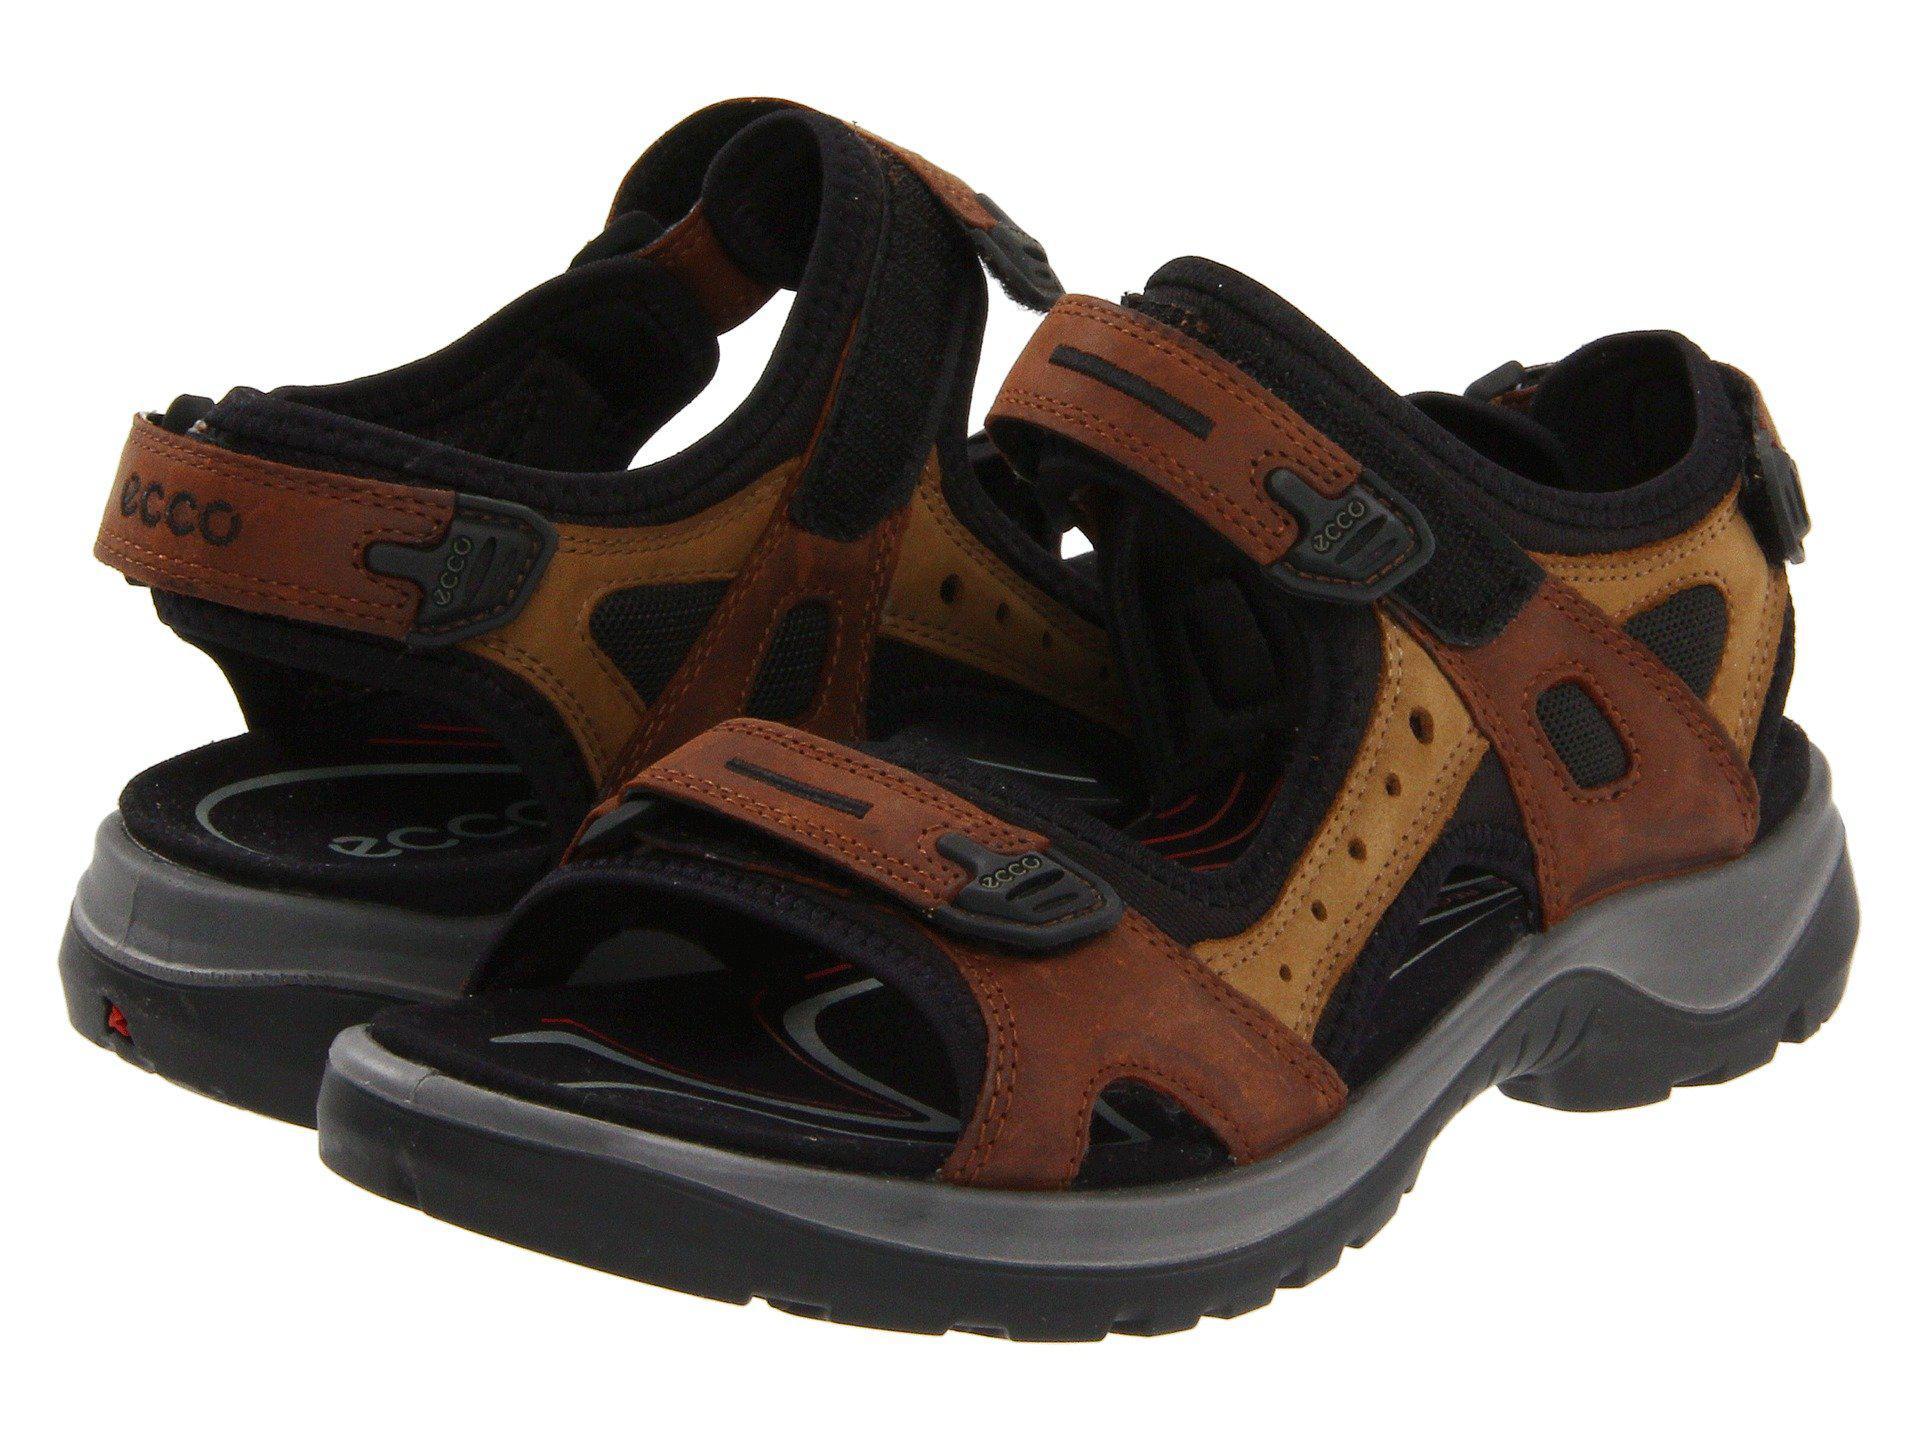 3bdb9b463e62 Lyst - Ecco Yucatan Sandal (stone) Women s Sandals in Brown